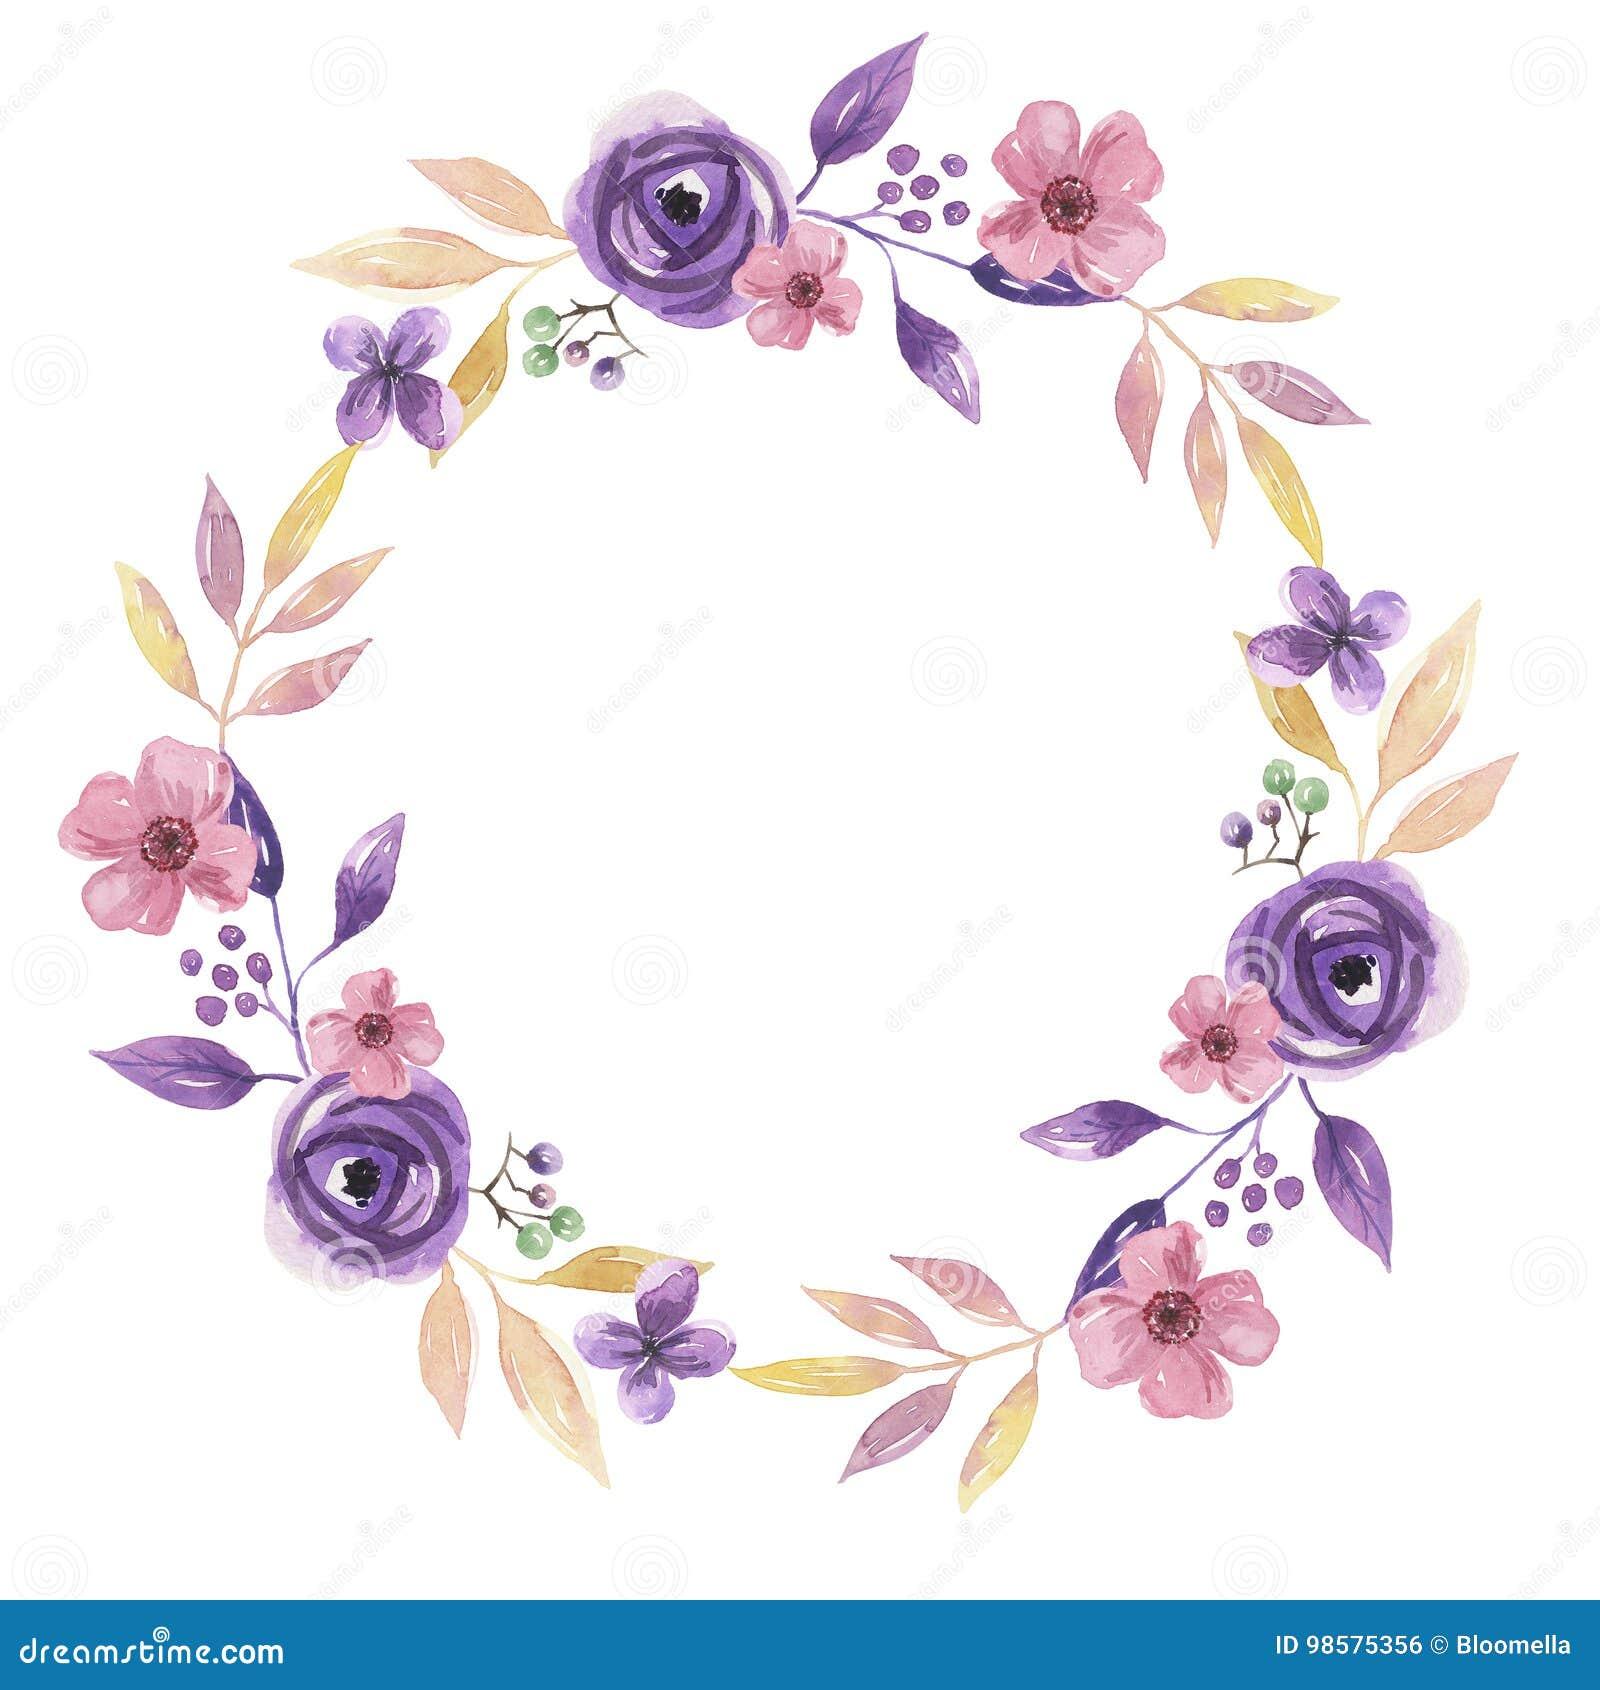 Watercolor Flower Hand Painted Garland Delicate Pink Purple Summer Floral Wreath Stock Illustration Illustration Of Arts Elegant 98575356